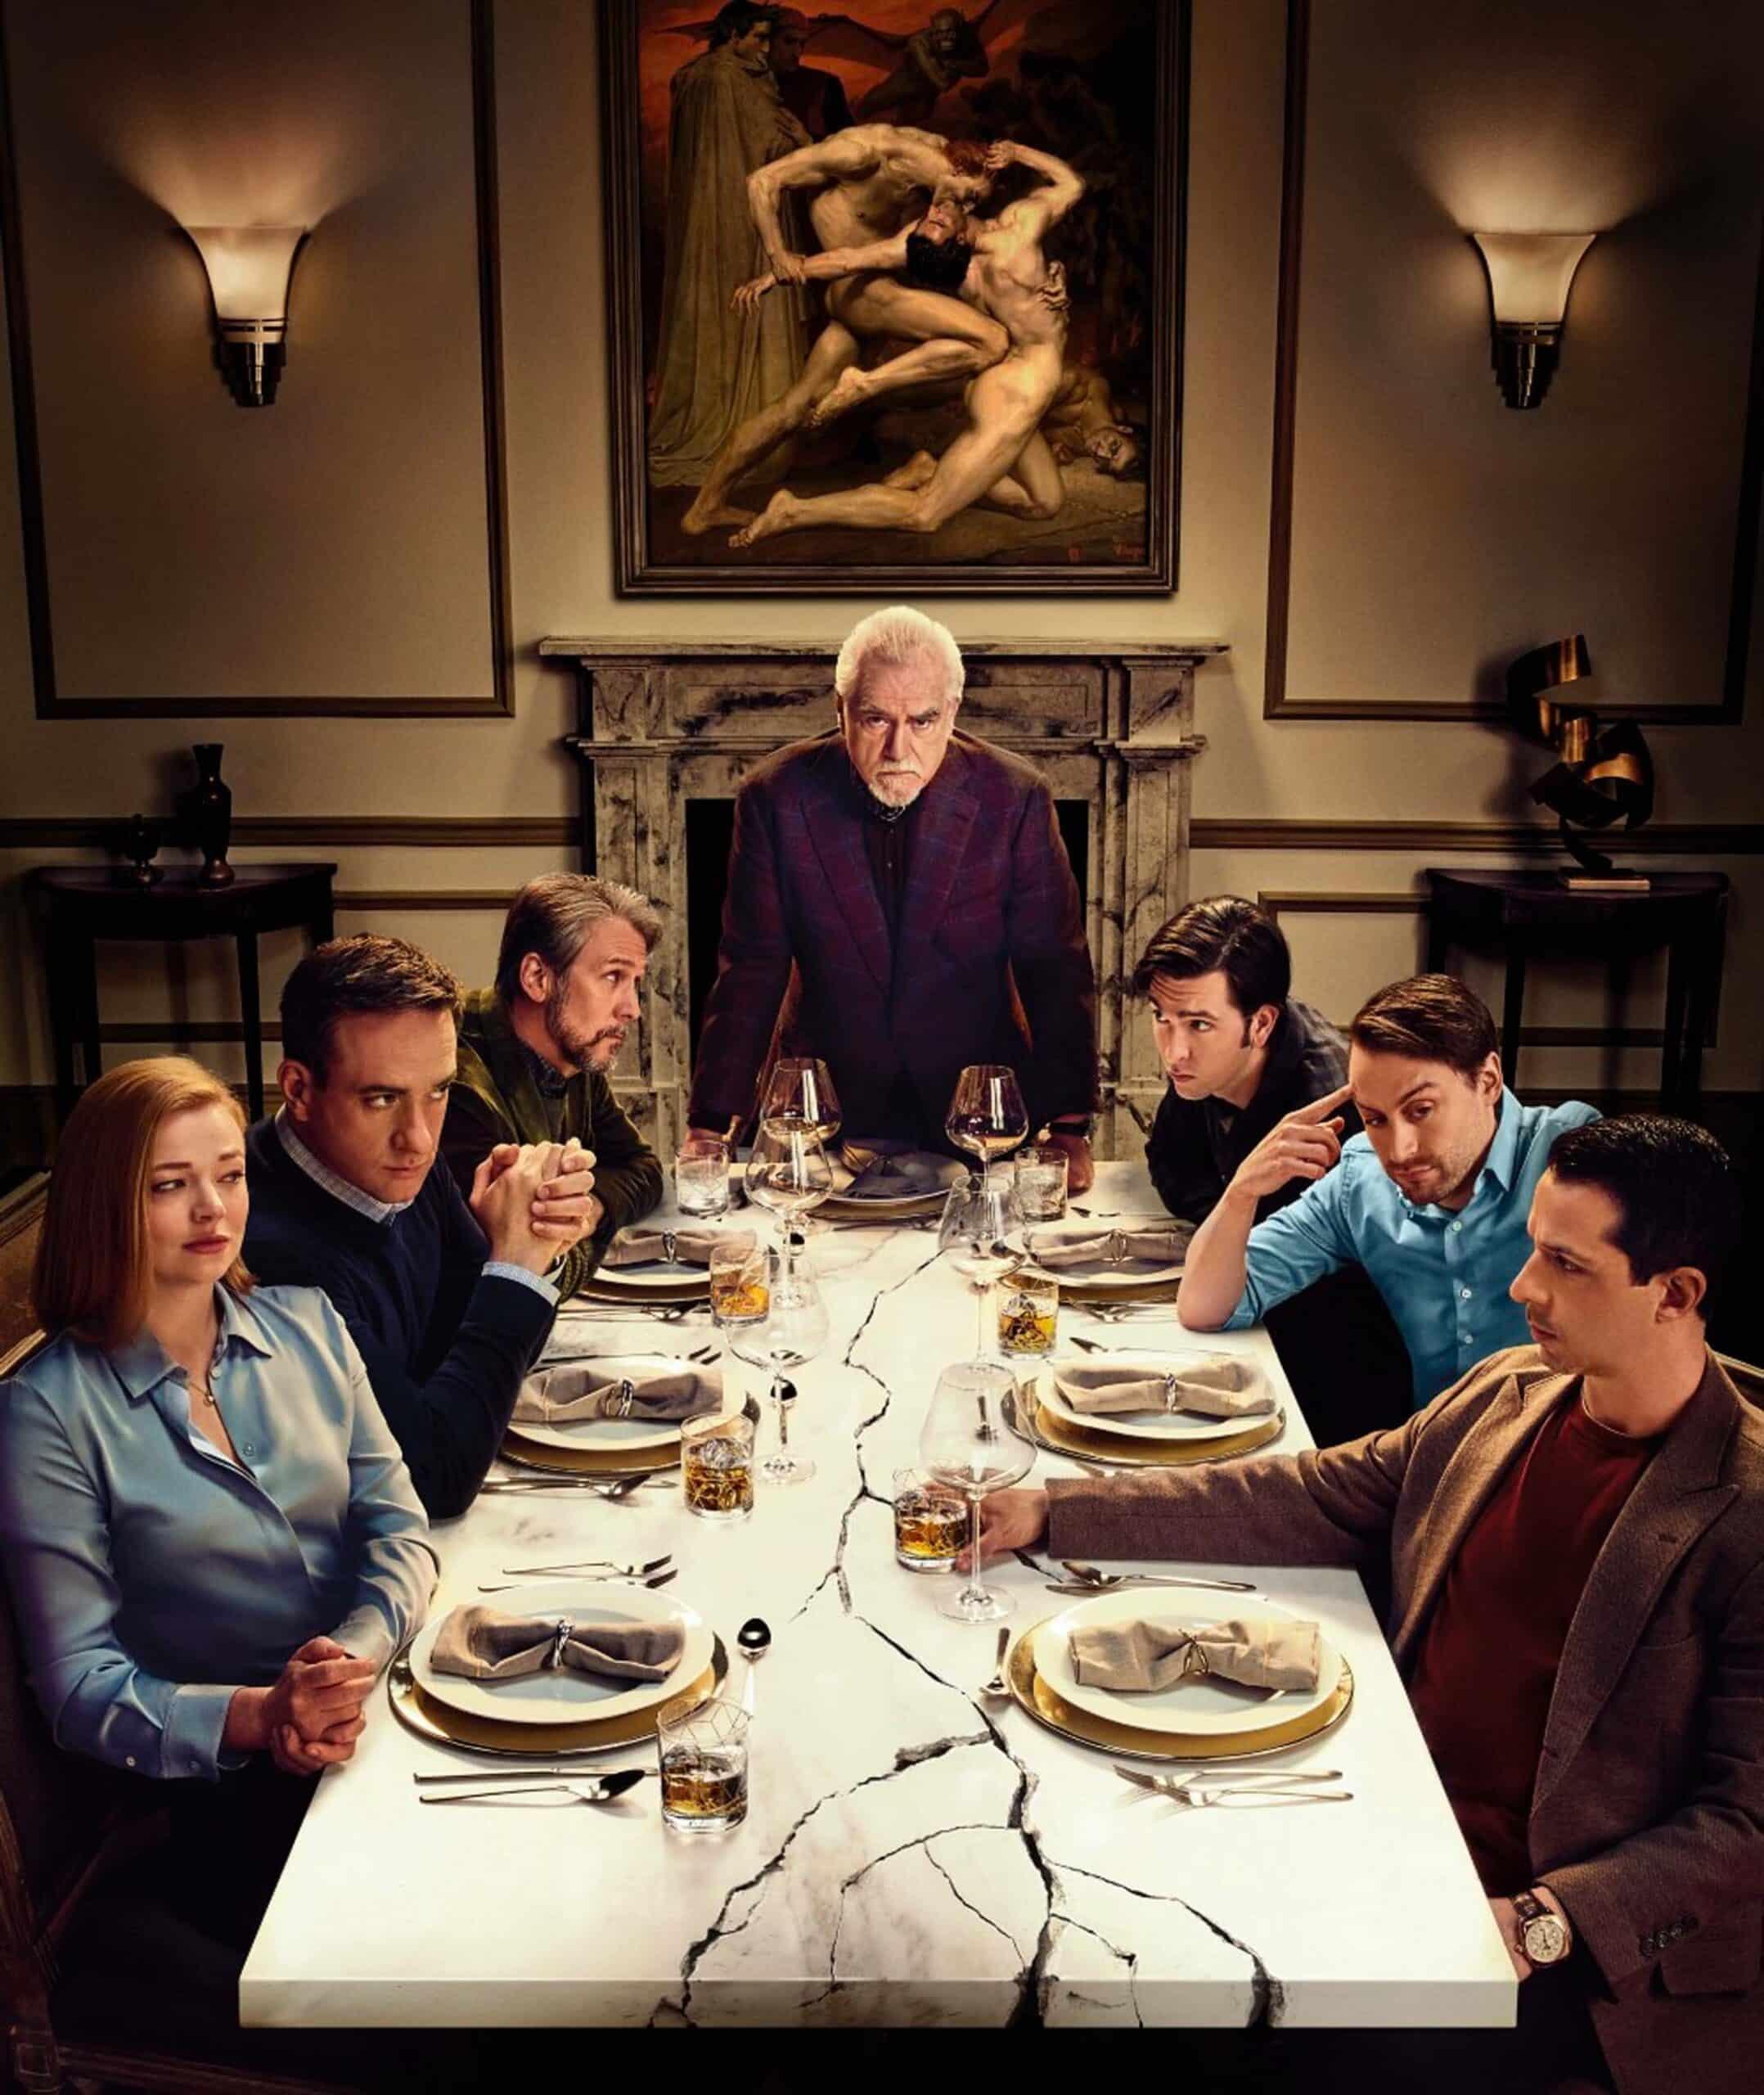 Familiemiddag hos the Roys 😬 (HBO)